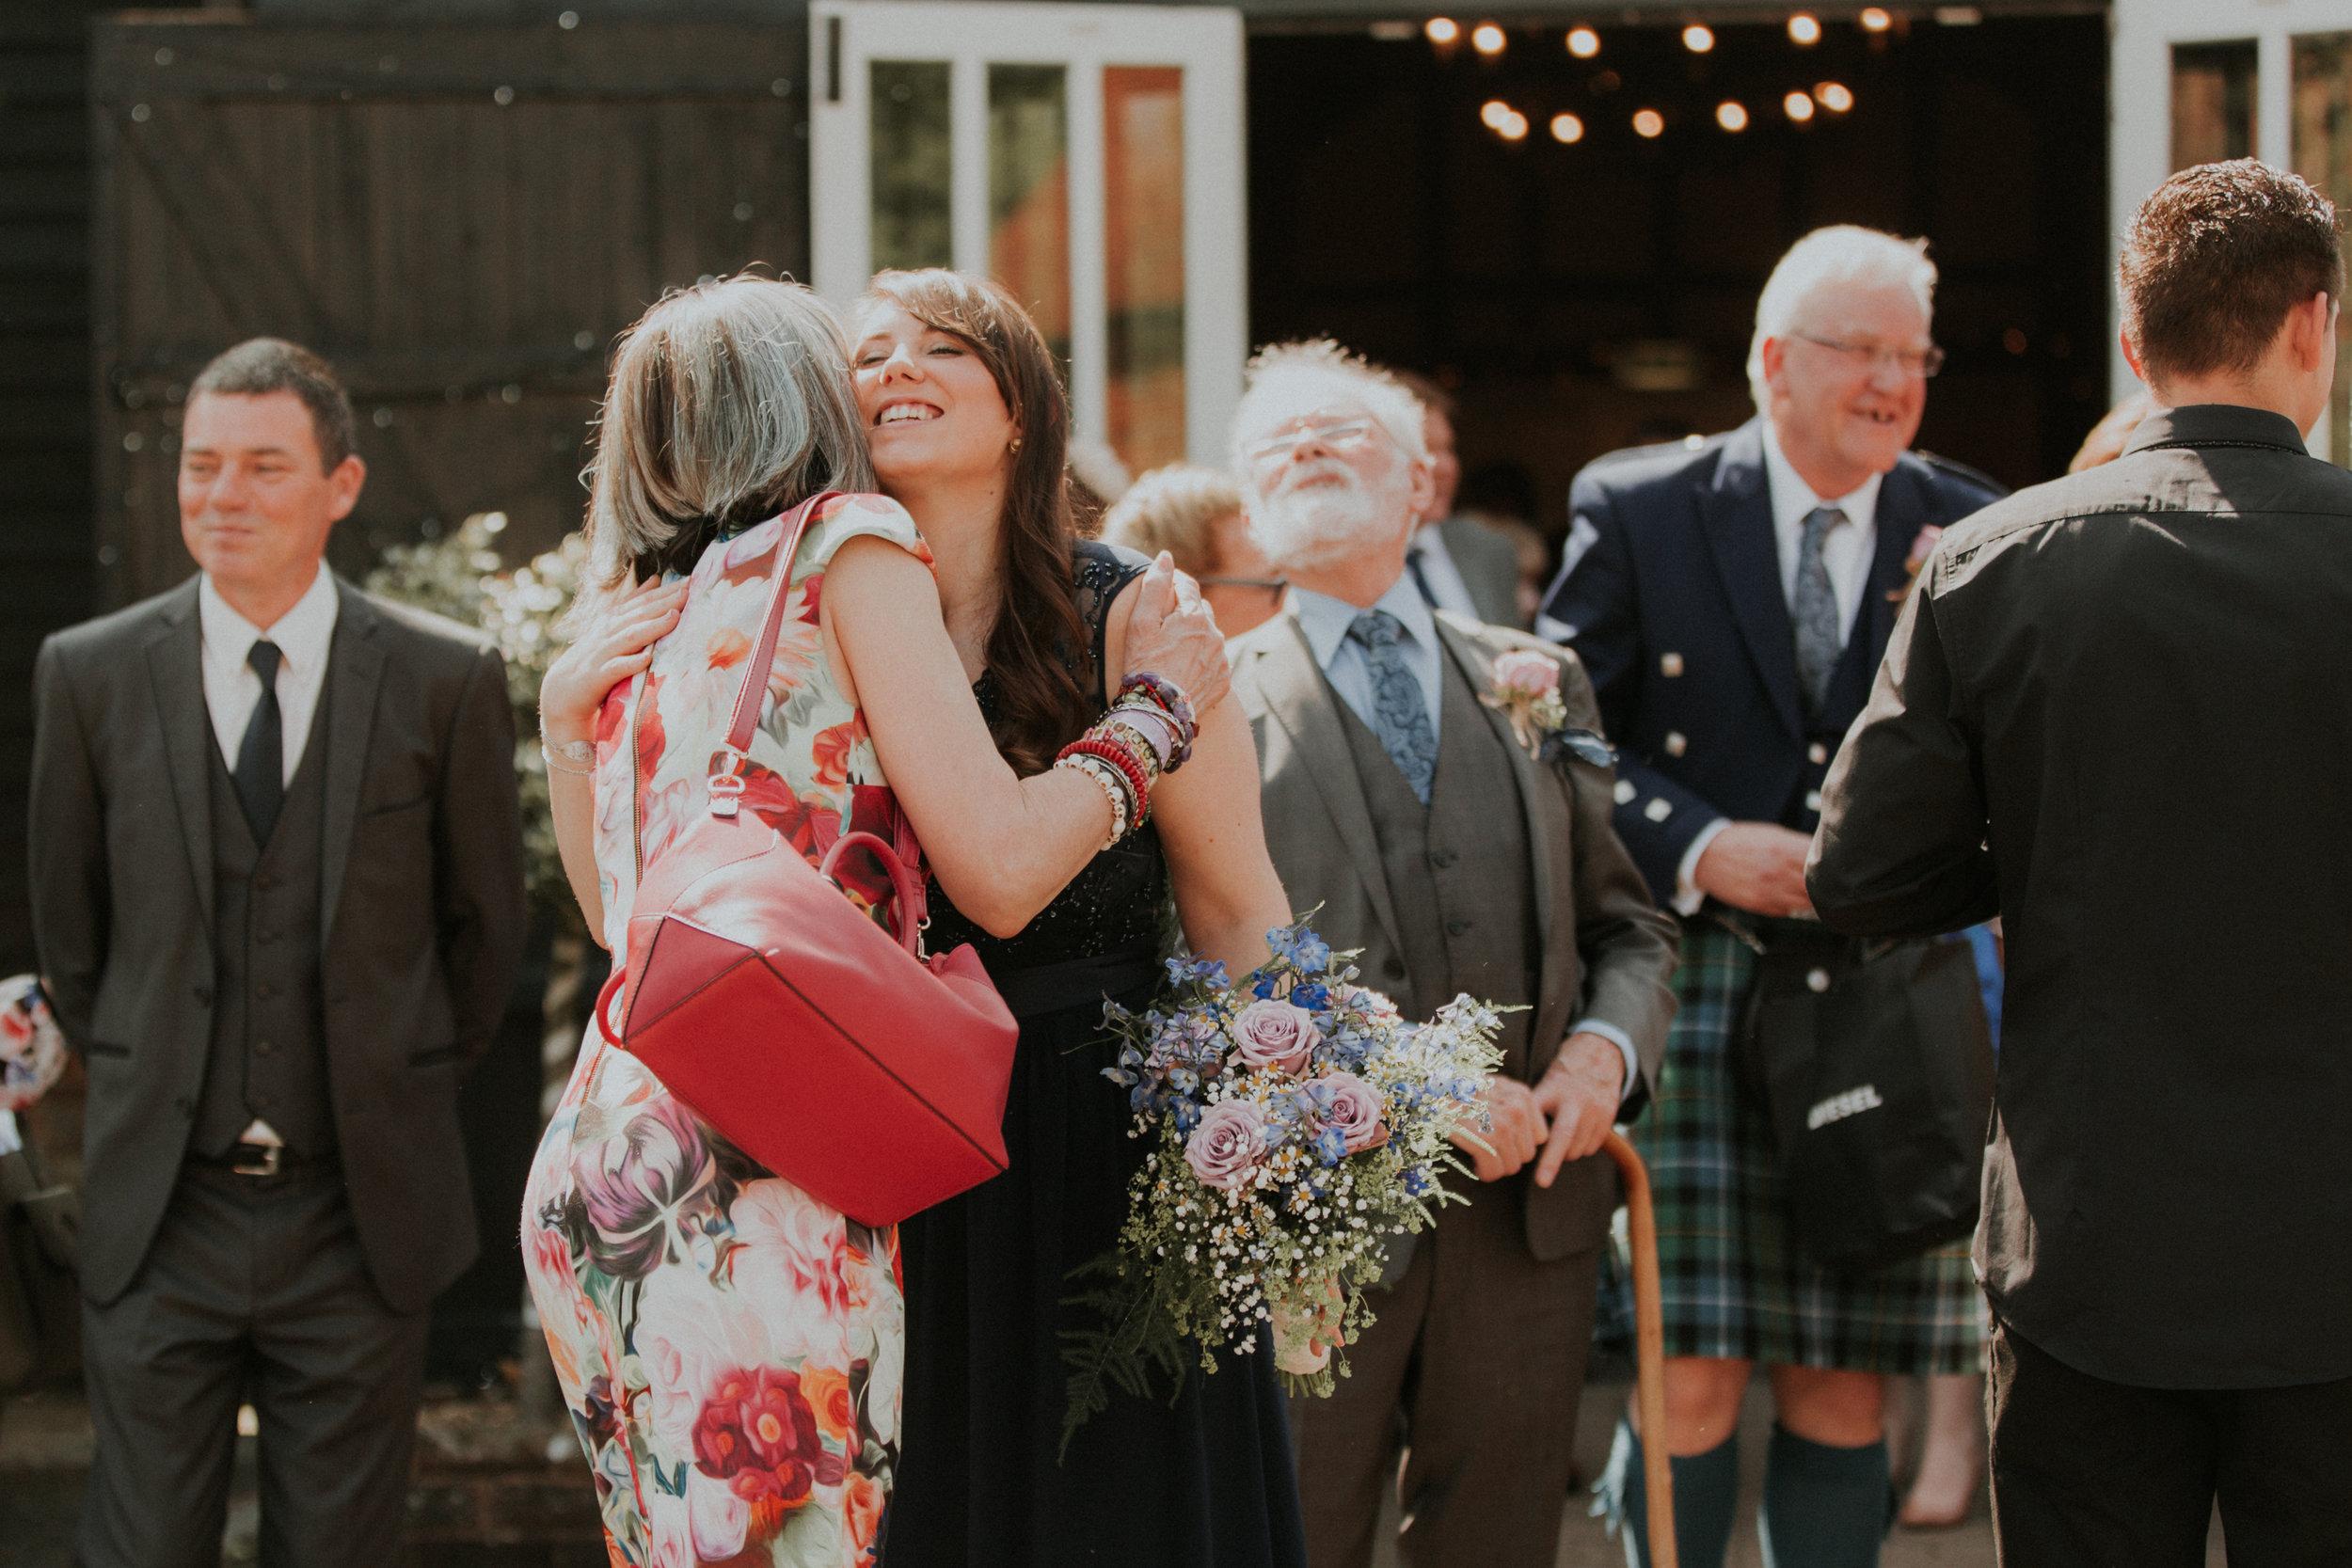 guests congratulating after wedding ceremony